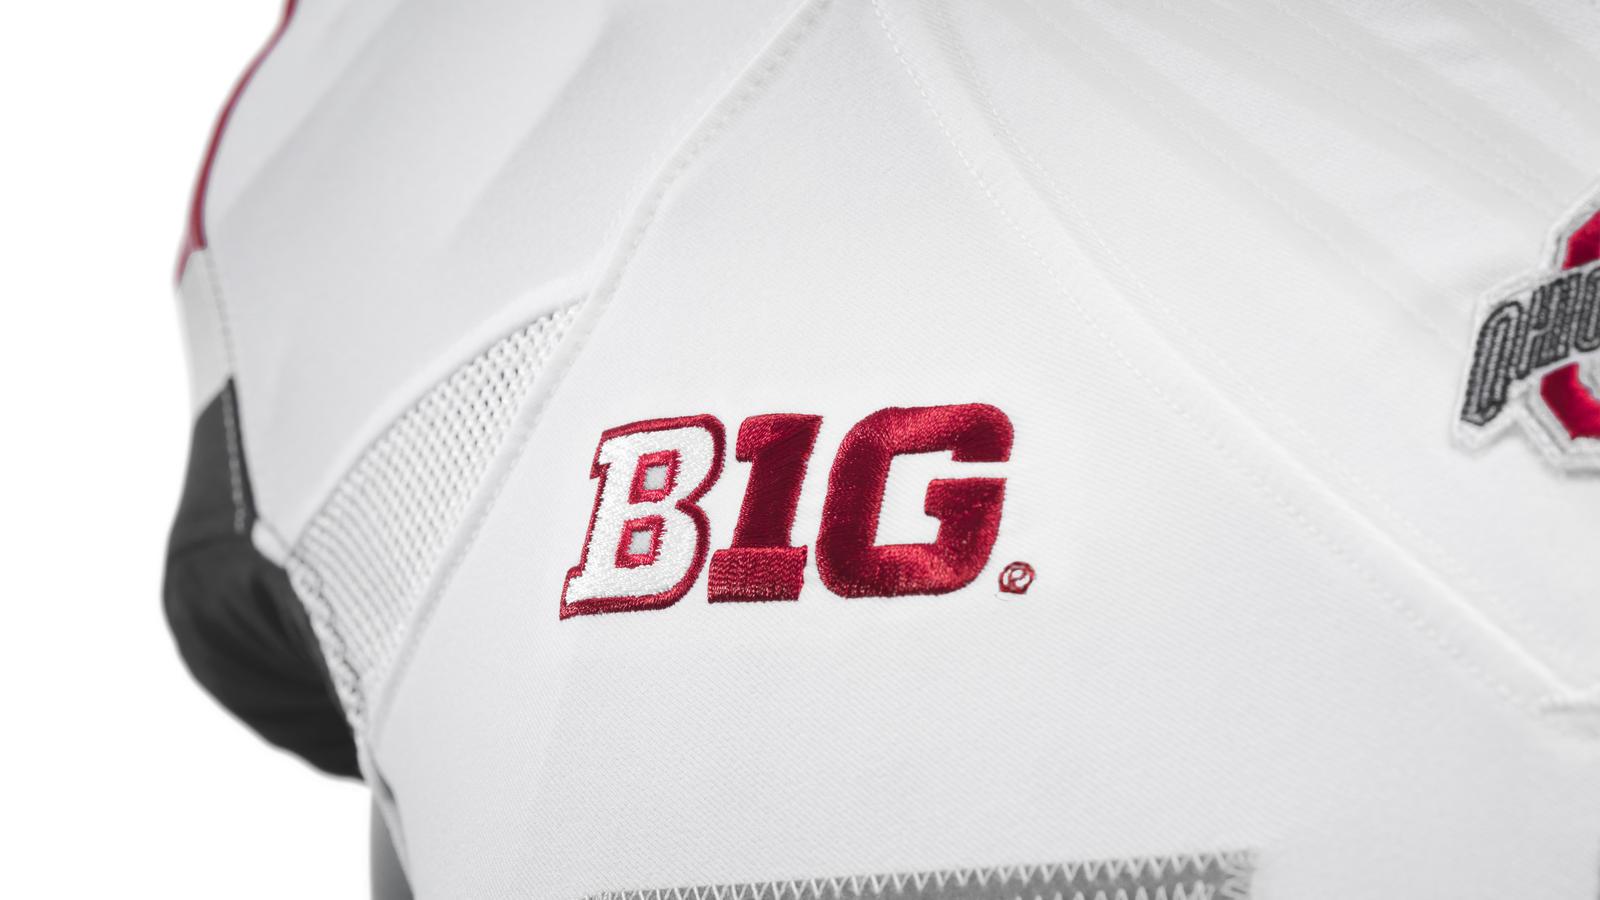 ncaa_fb13_uniforms_ohio_big_0051